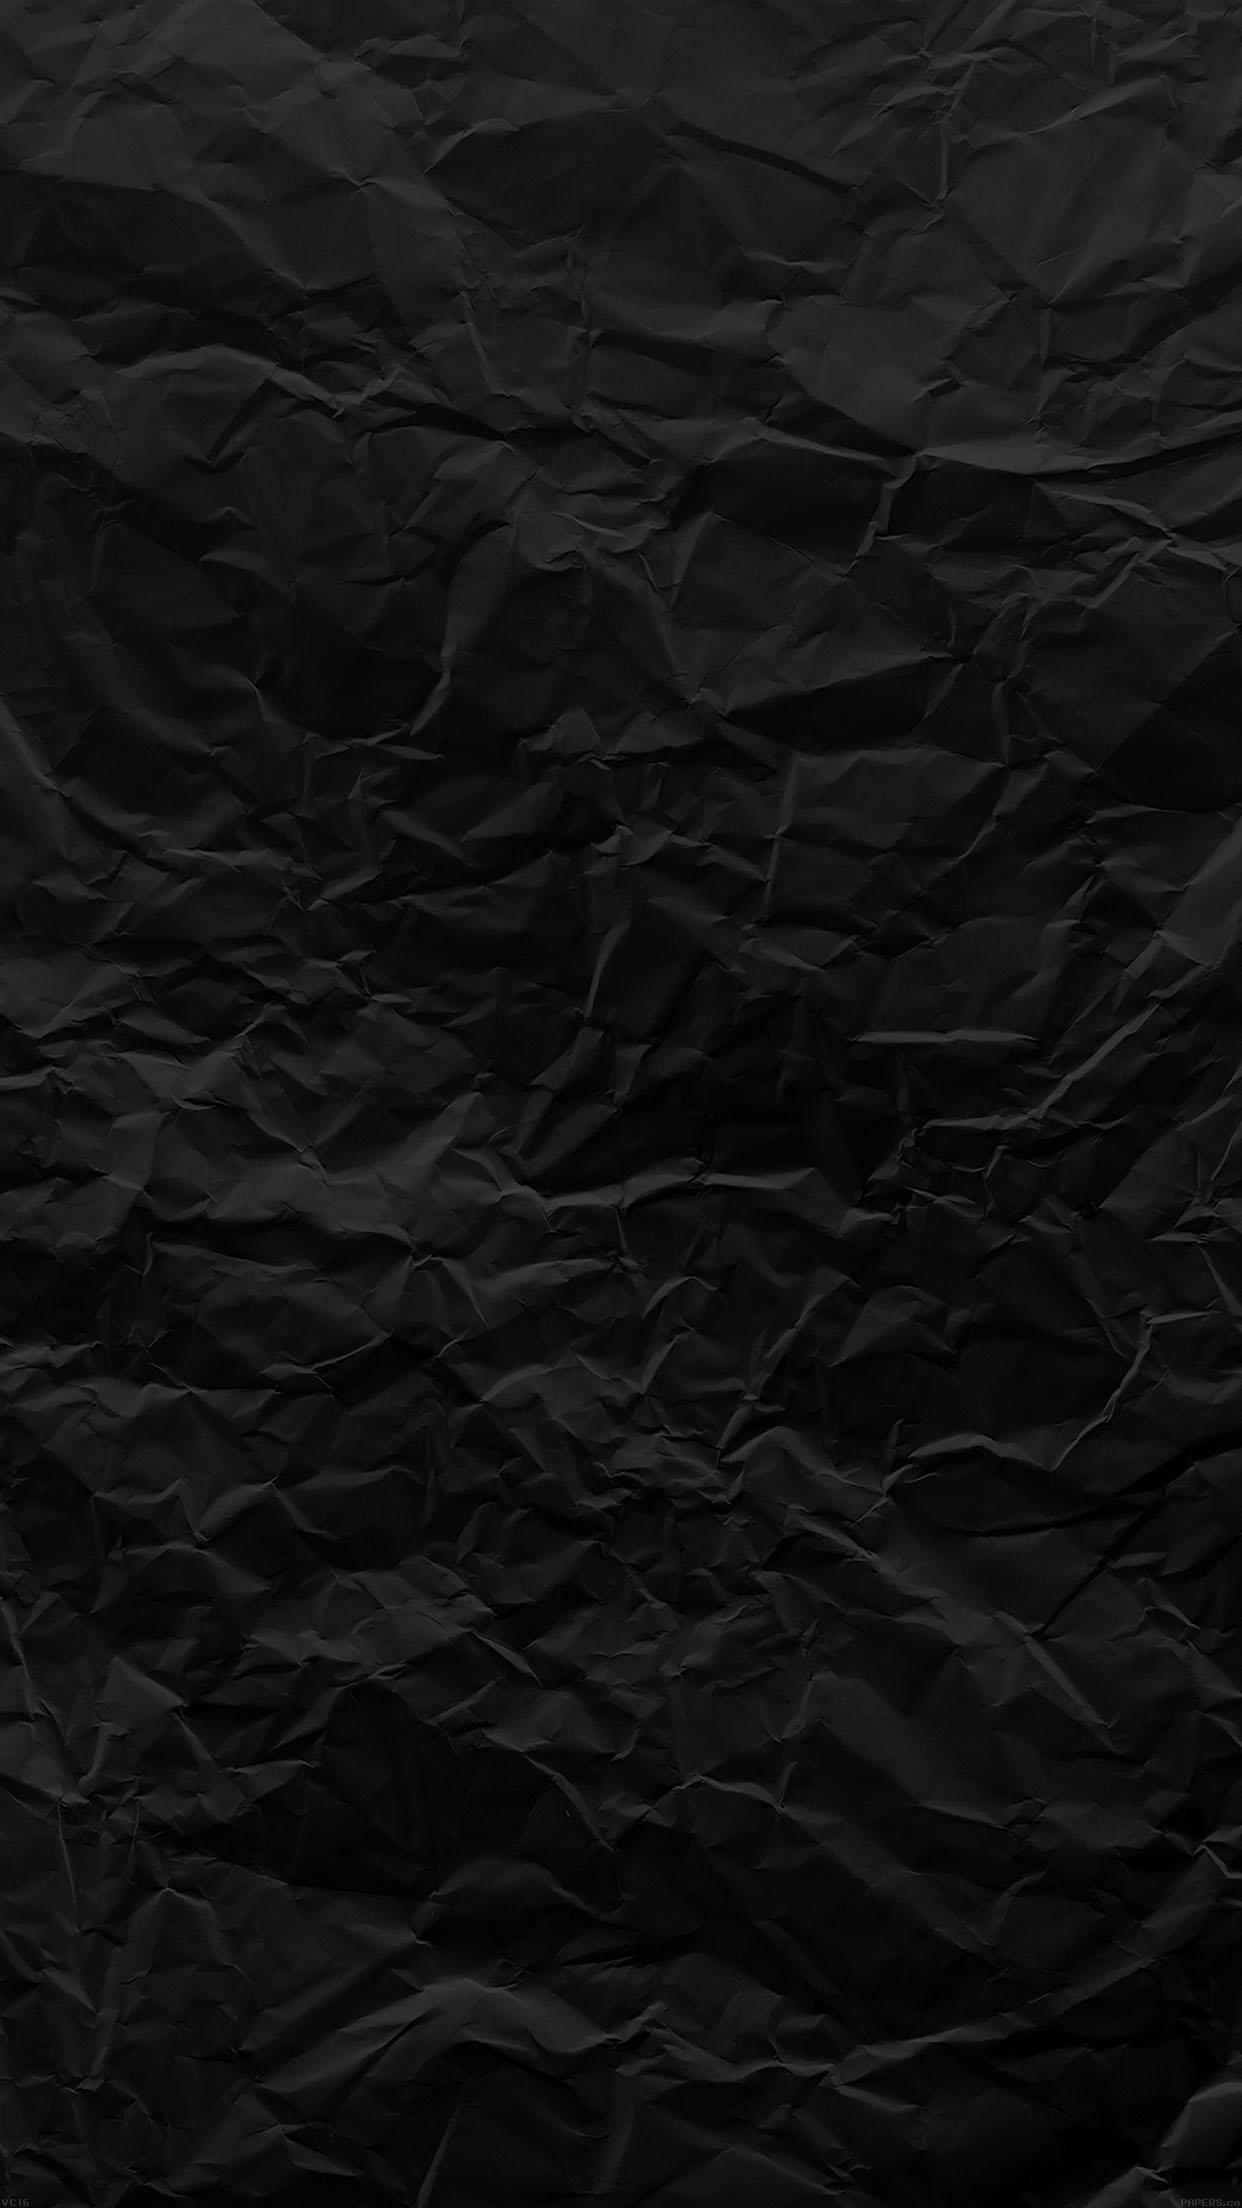 Apple Logo Lg G2 Wallpapers Hd 227 Data Src Apple Apple Wallpaper Hd 1080x1920 Download Hd Wallpaper Wallpapertip